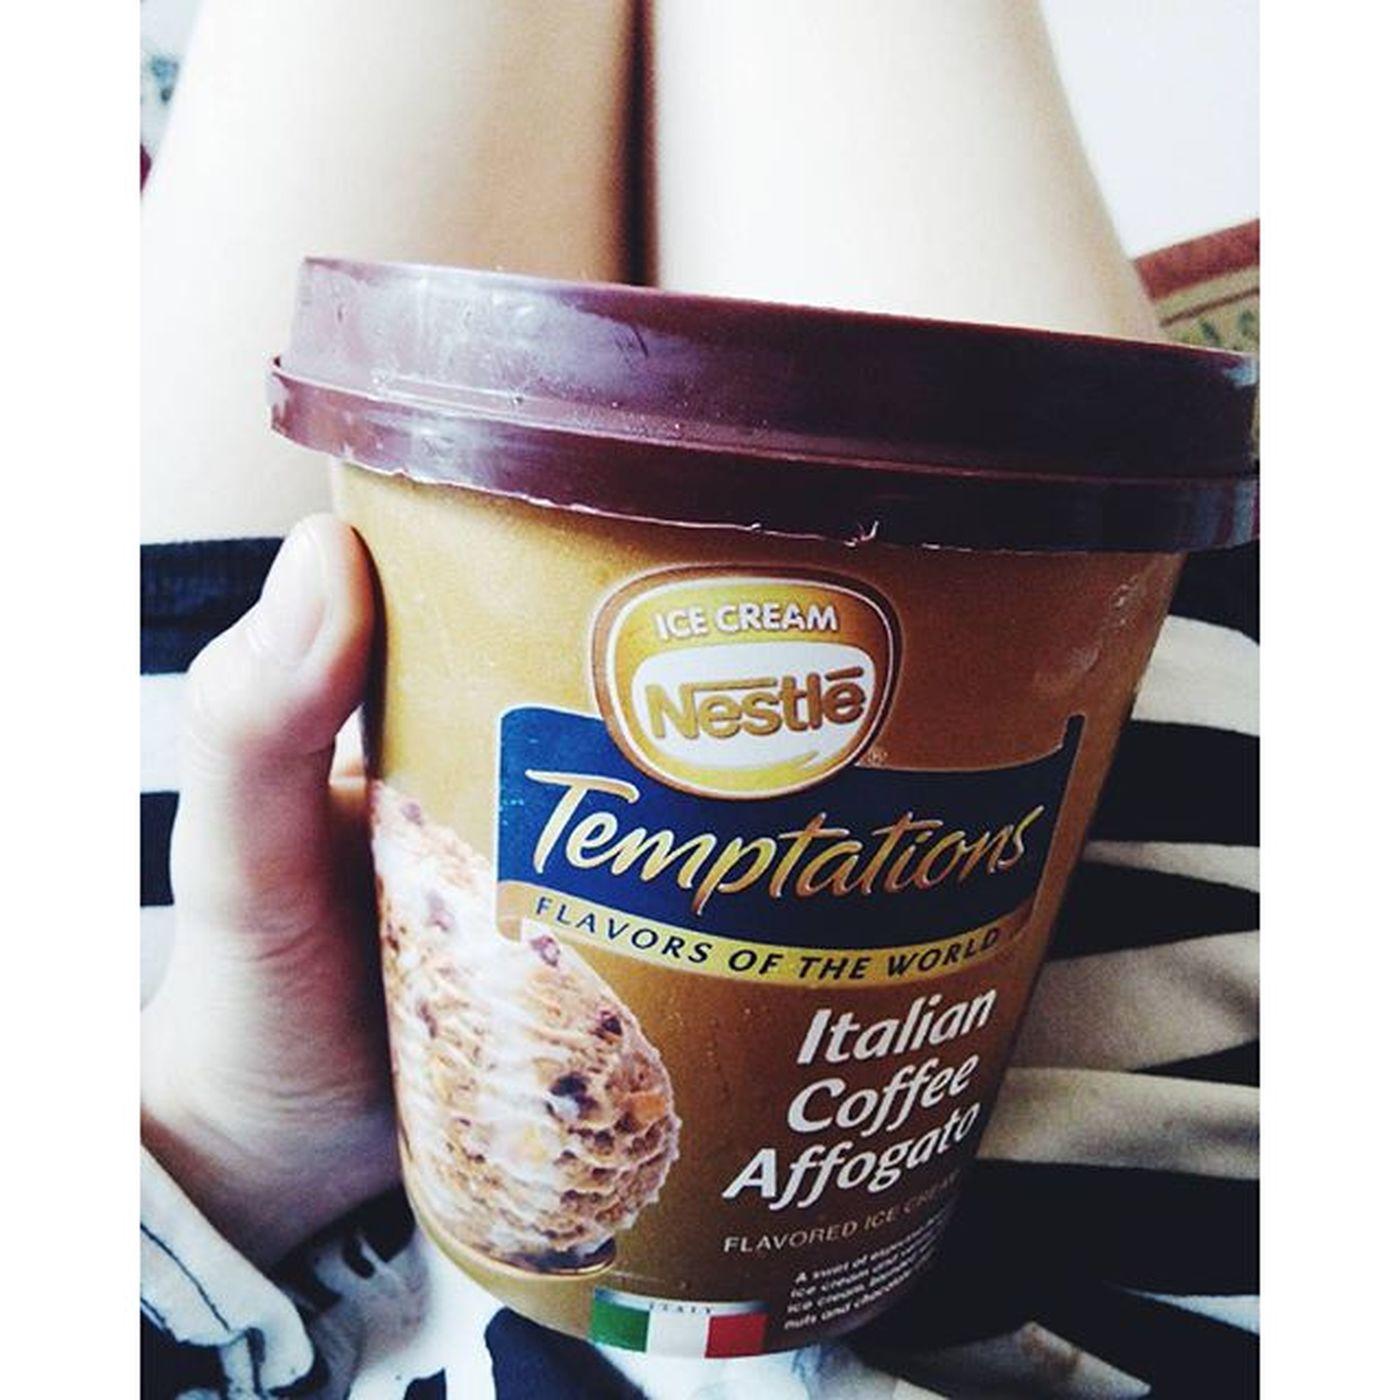 Temptation.🍦@nestletemptations Dessert Food Italiancoffeeaffogato Nestleicecreamph